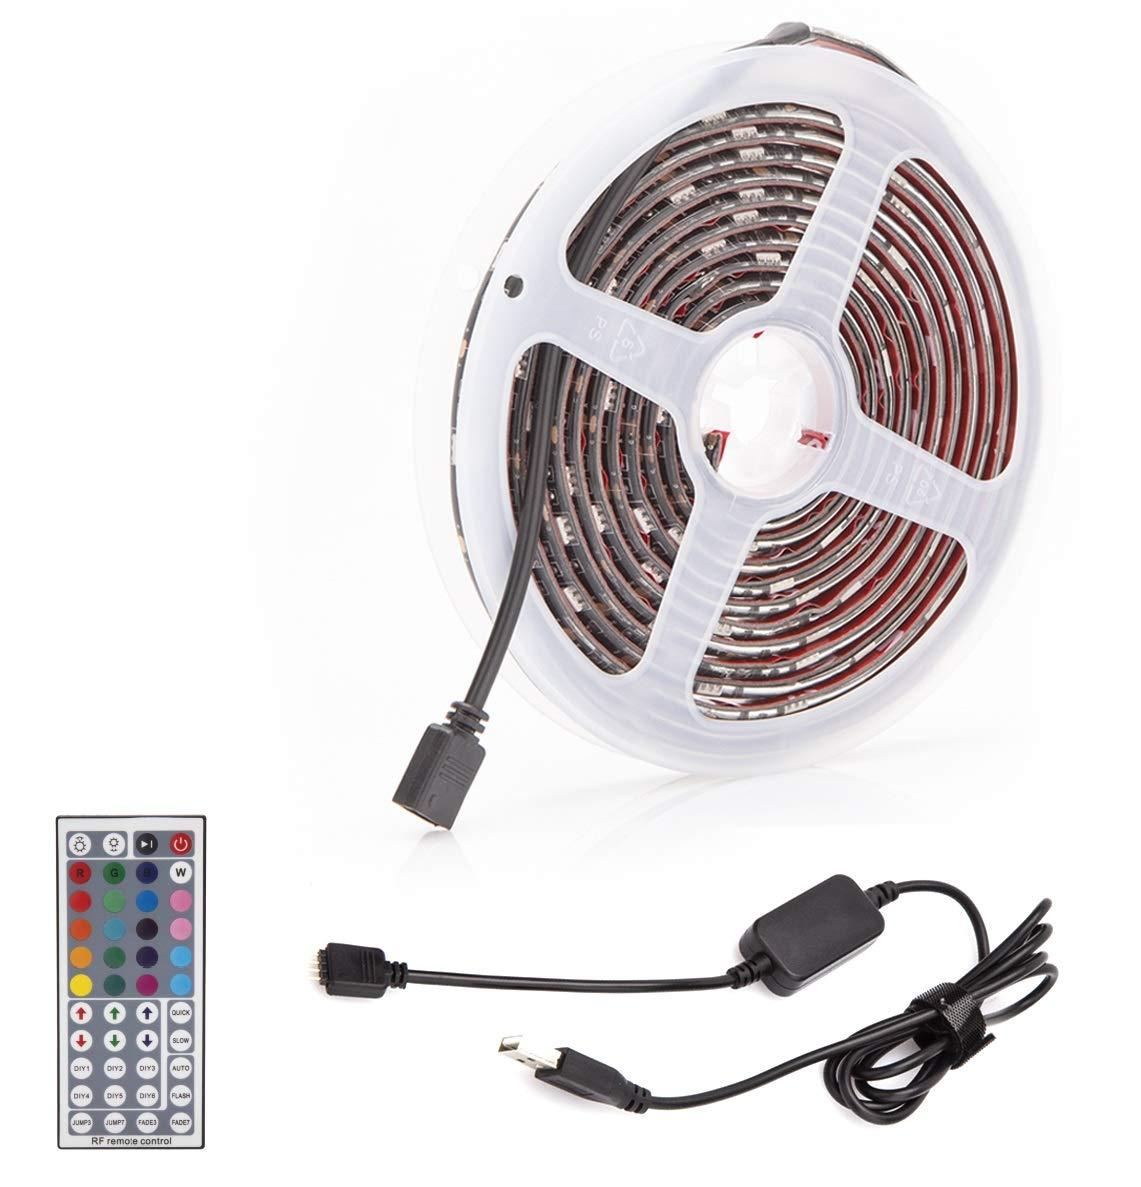 ALOTOA 118 Inch USB LED TV Strip, 44 key Remote Control RGB LED TV Backlighting Strip, 10ft Bias Lighting for 55-75 HDTV Desktop PC Kitchen Bedroom Automotive Under Cabinet Home Theater TongYa